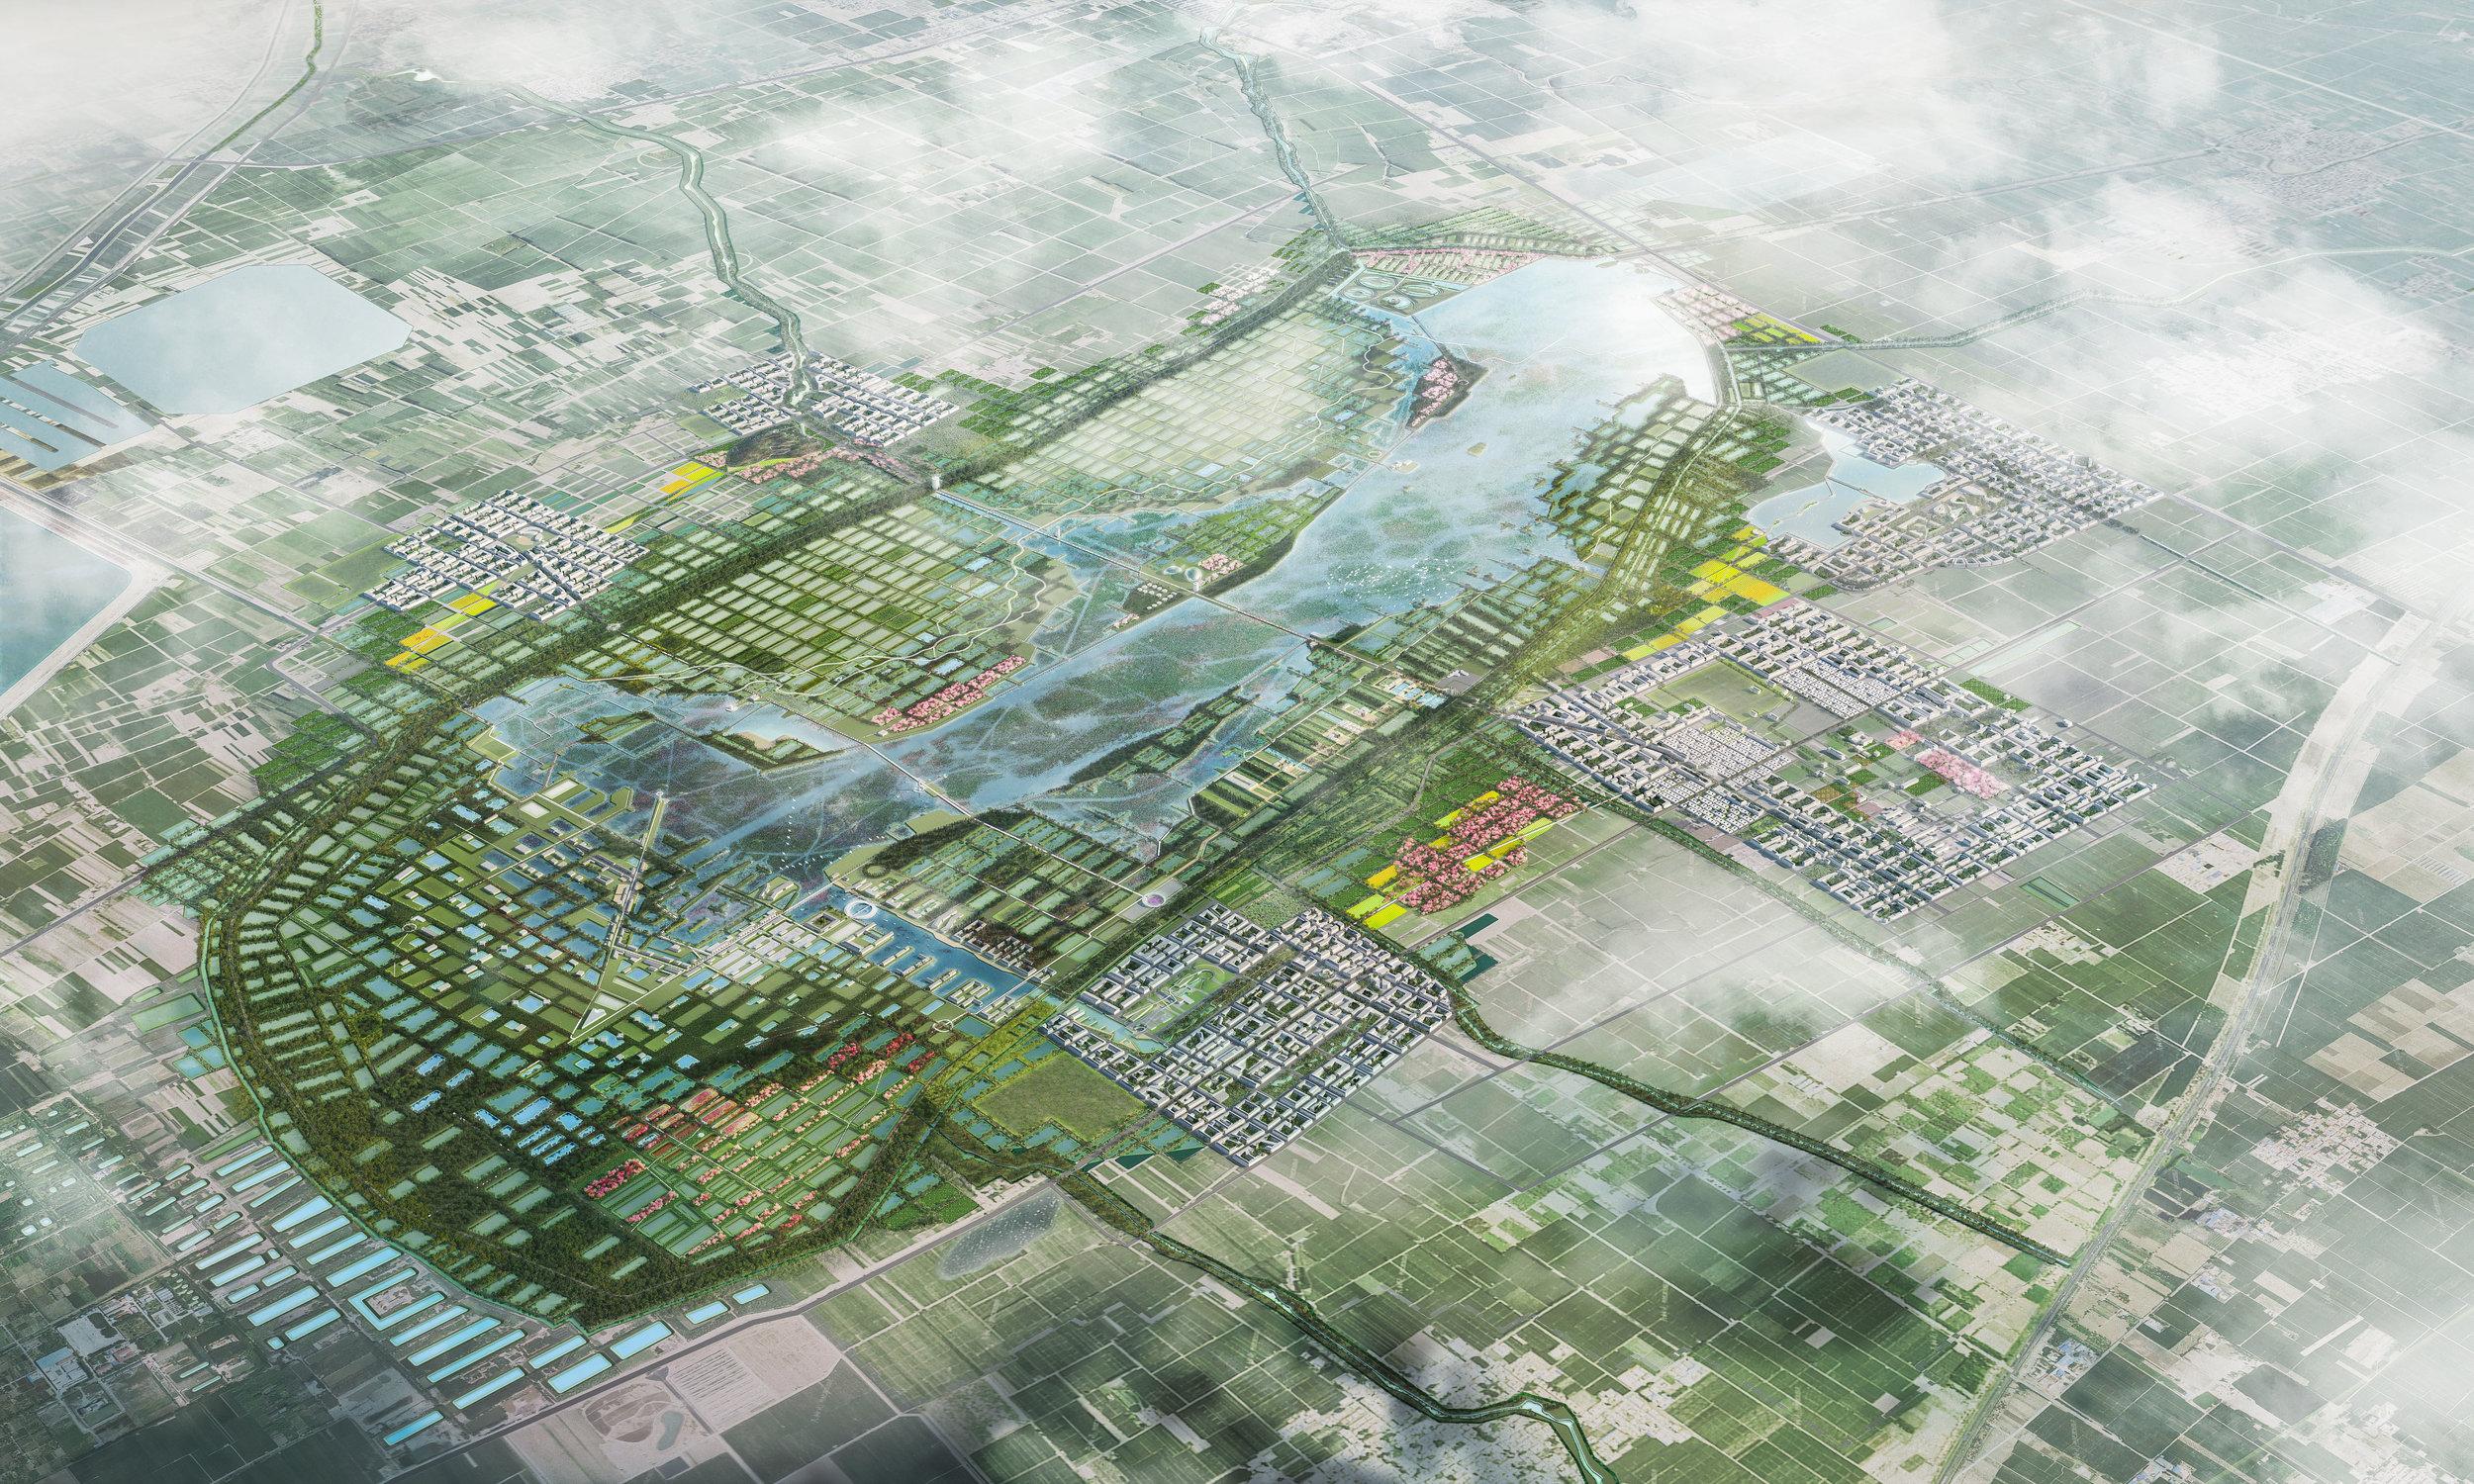 ....BAIYUN LAKE WETLAND PARK MASTERPLAN AND SANHU AREA URBAN DESIGN..    白云湖湿地公园整体规划设计及三湖片区城市设计....